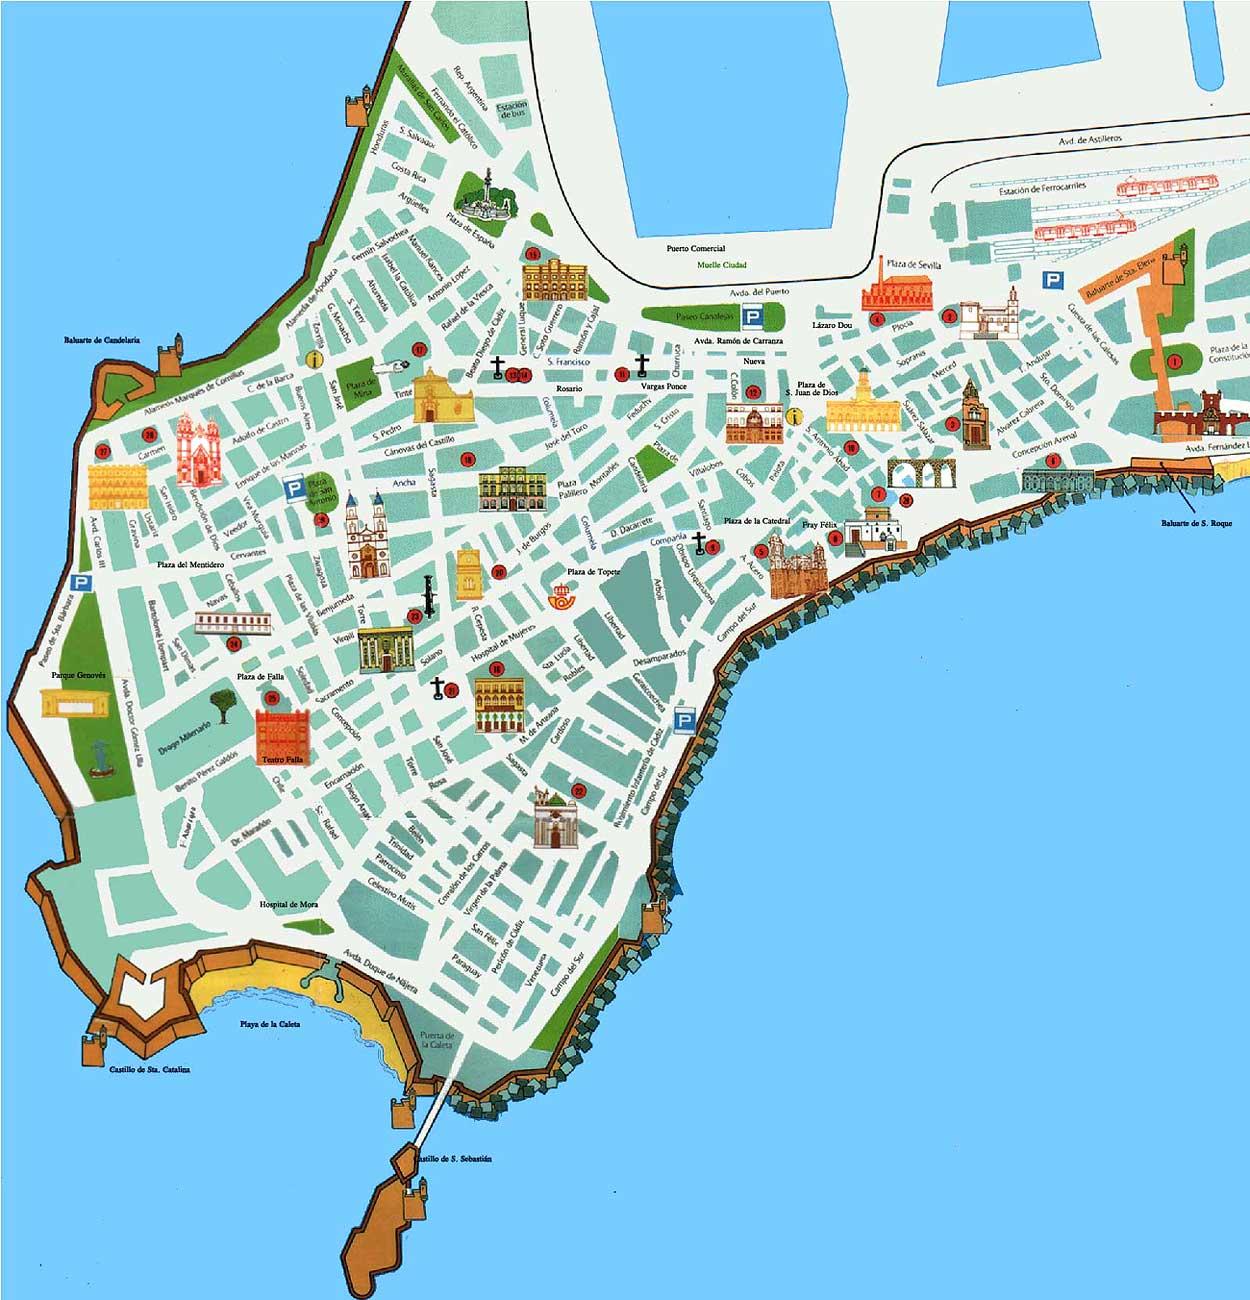 Mapa de c diz per metro urbano for Piscina ciudad de cadiz